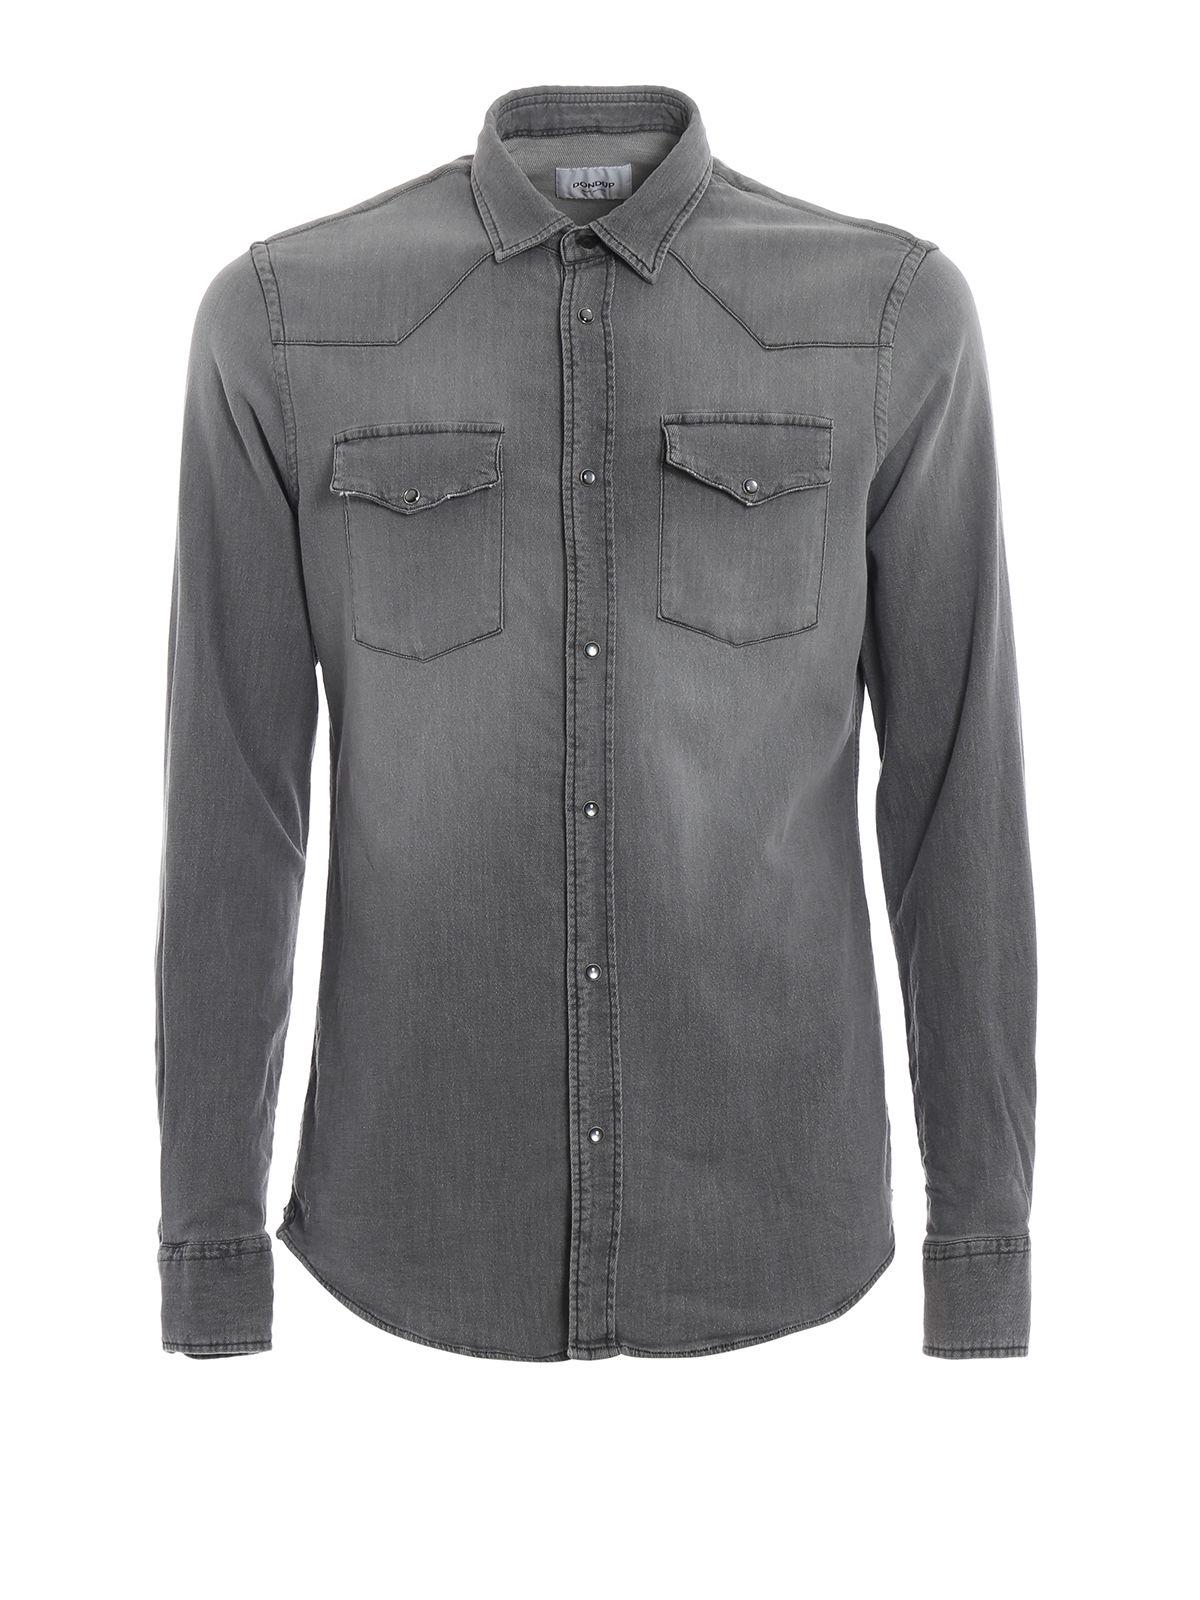 Neely Light Wash Grey Denim Shirt